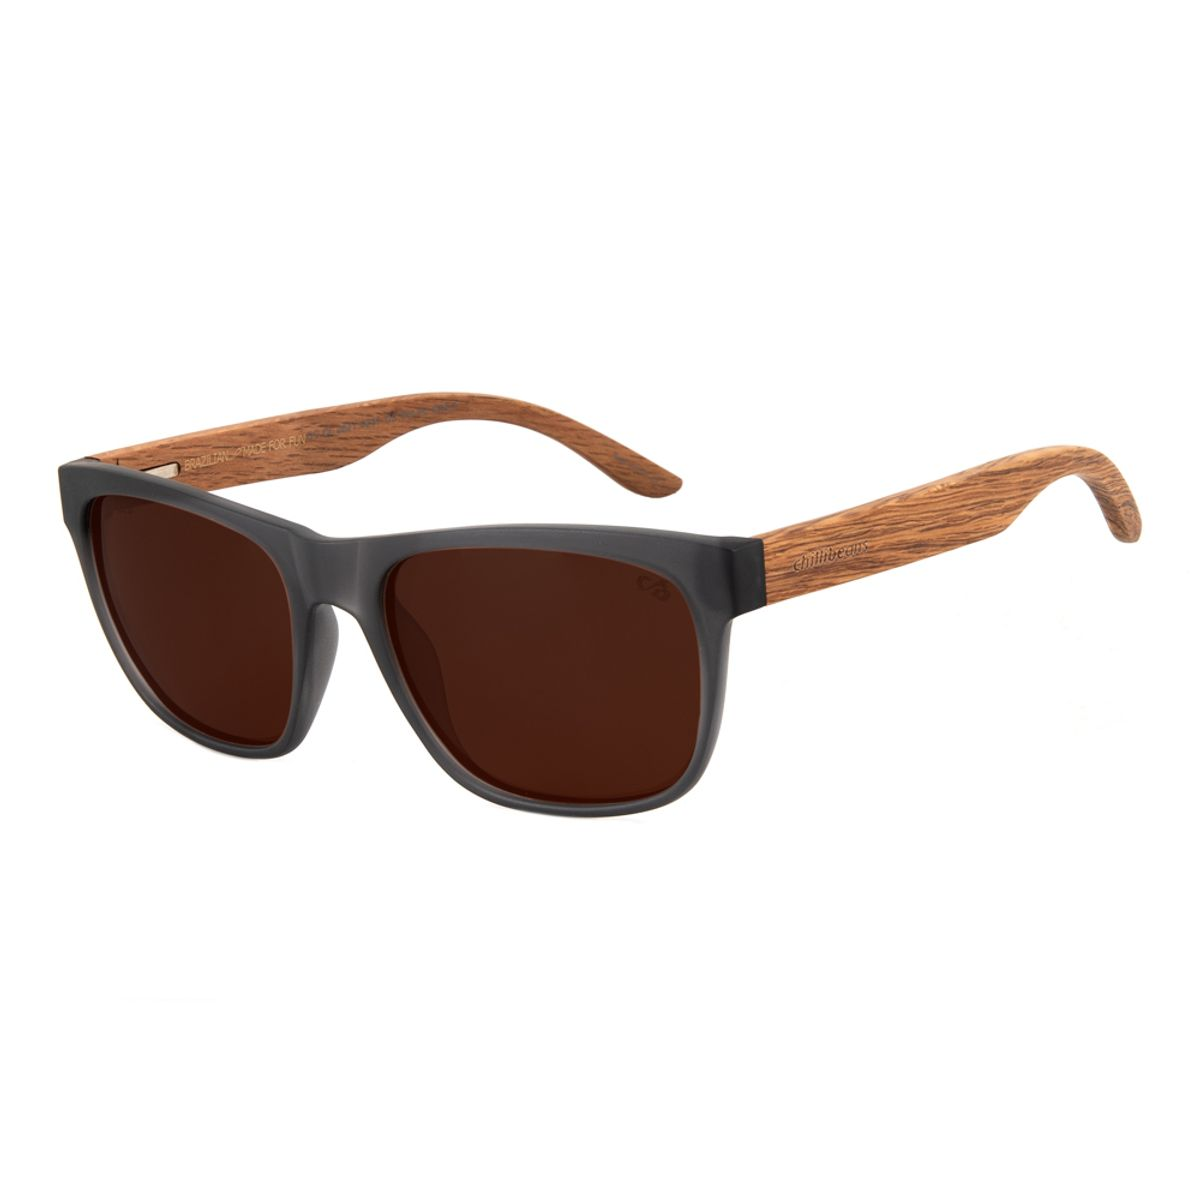 62f336f74 Óculos de Sol Chilli Beans Masculino Haste de Madeira Marrom Fosco ...